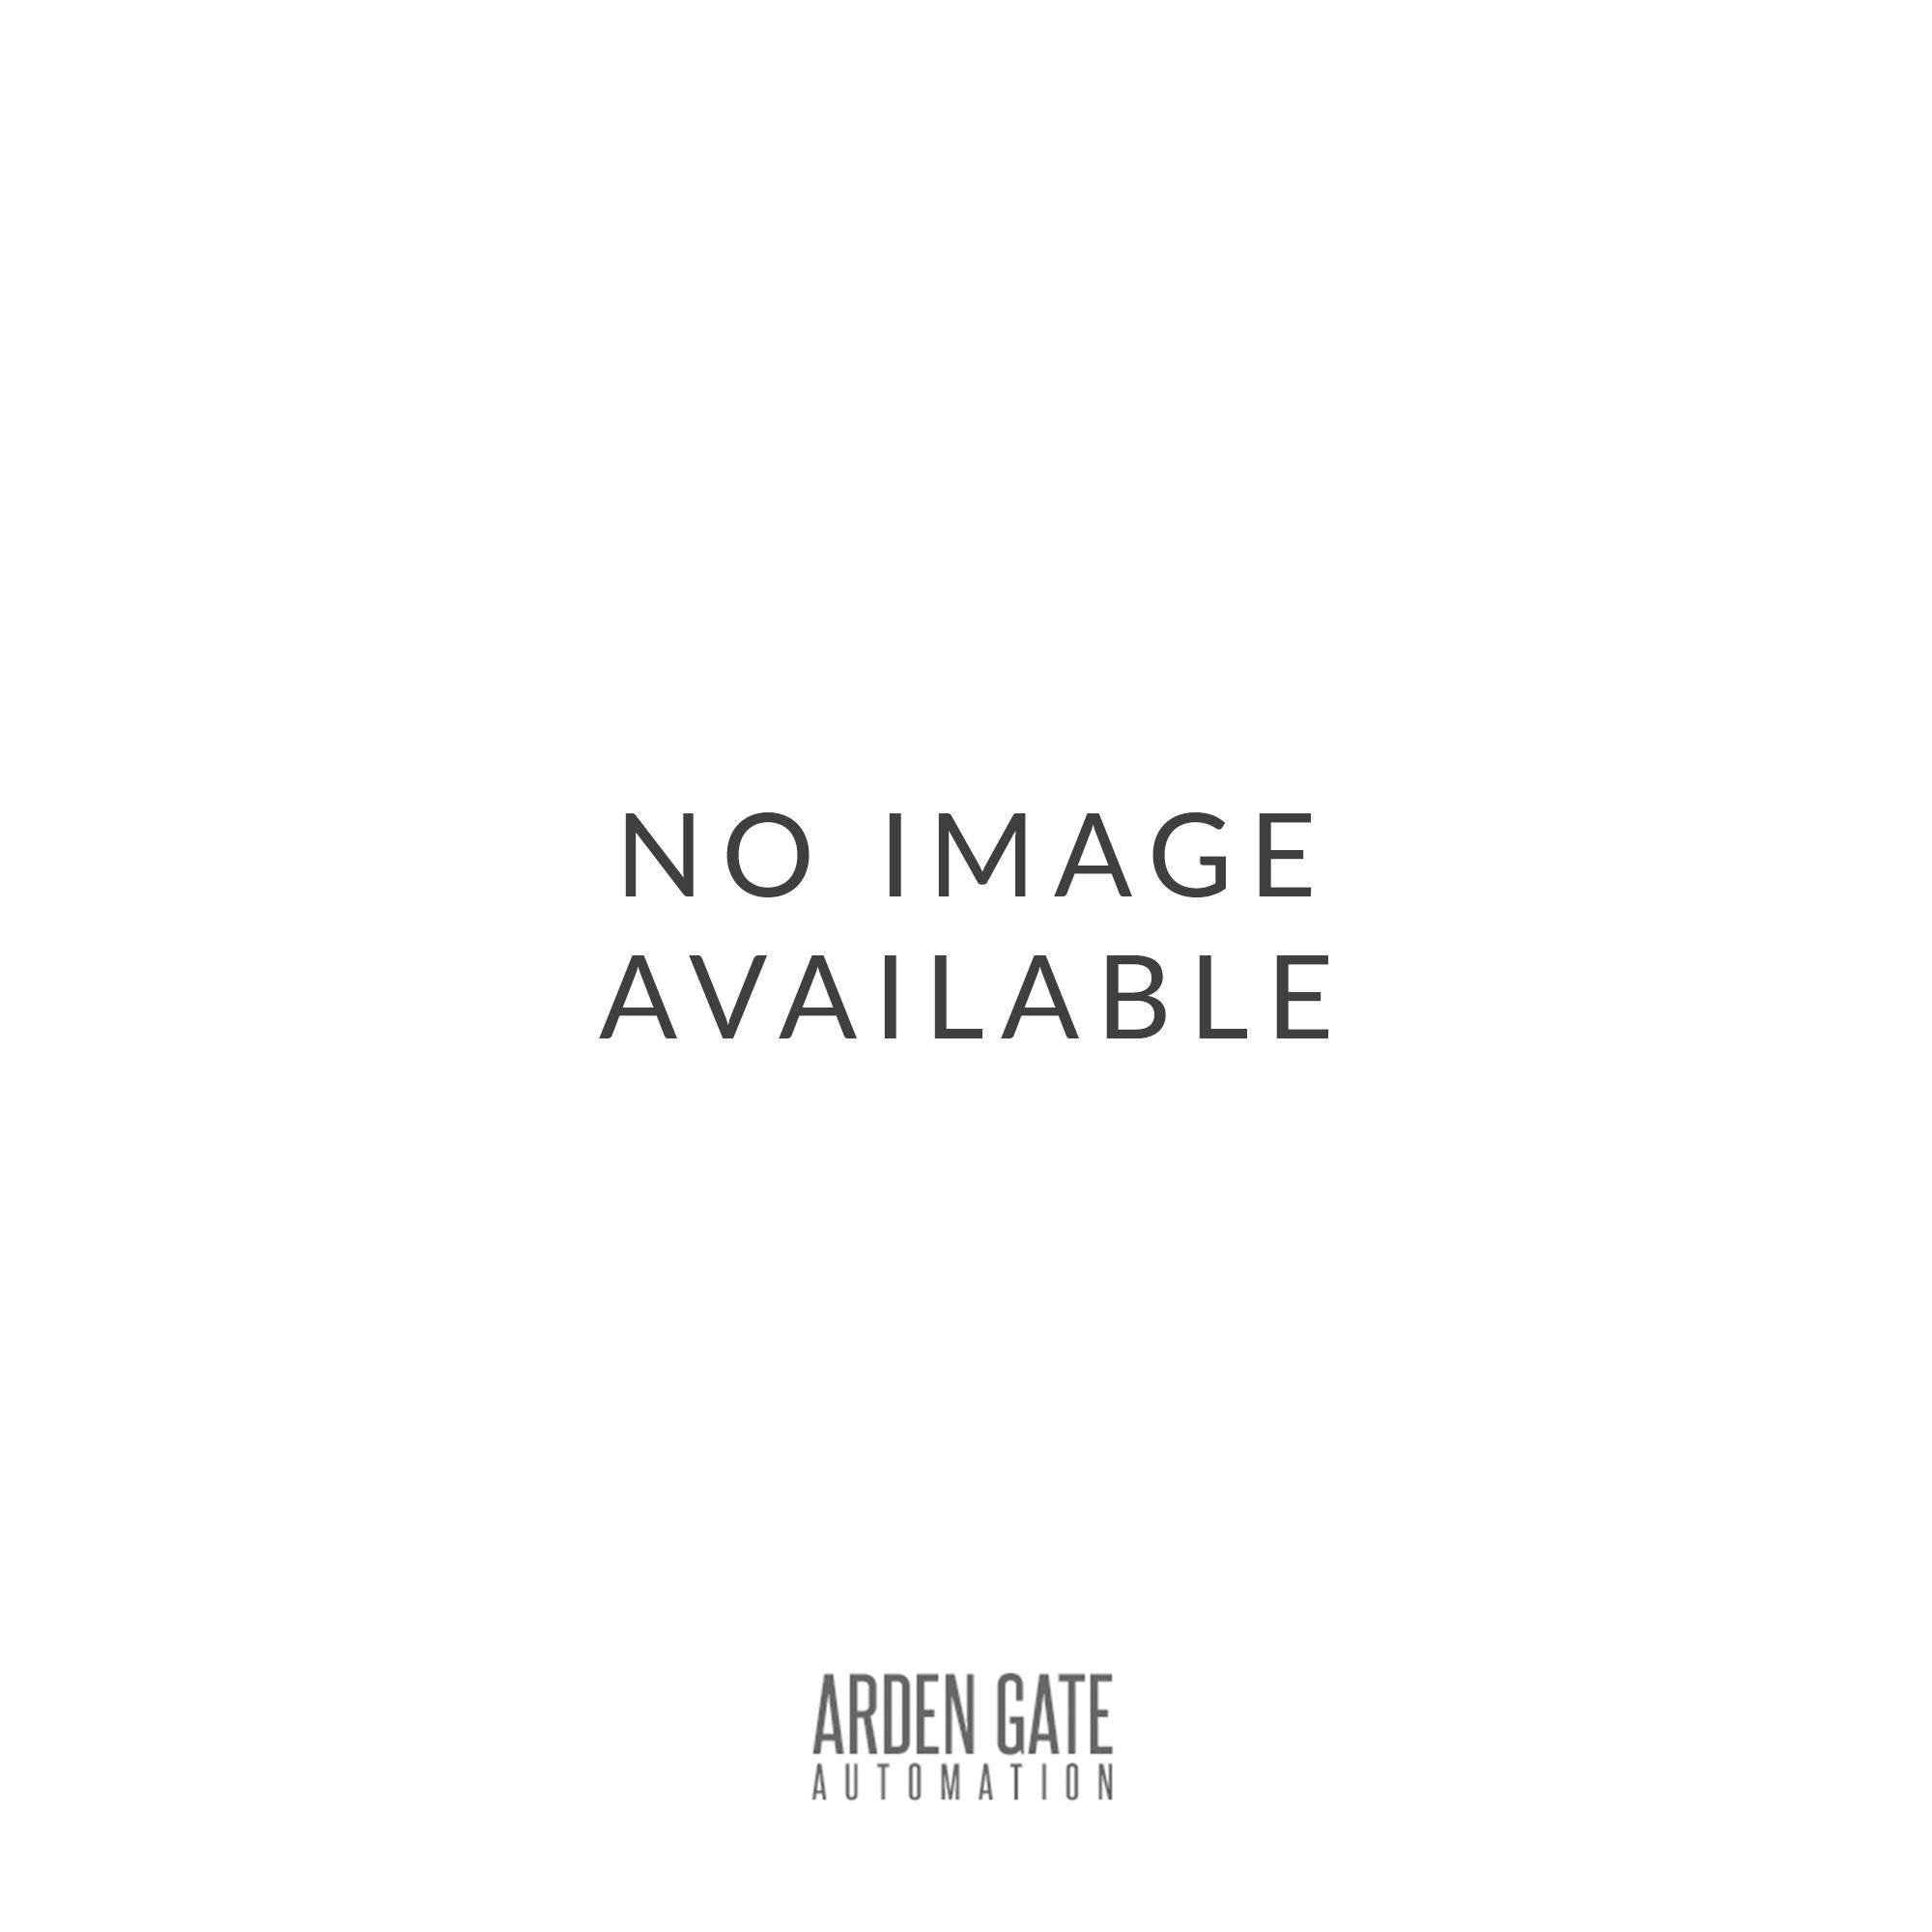 BFT Rigel 5 Control panel & enclosure **NOW OBSOLETE** Now Rigel 6